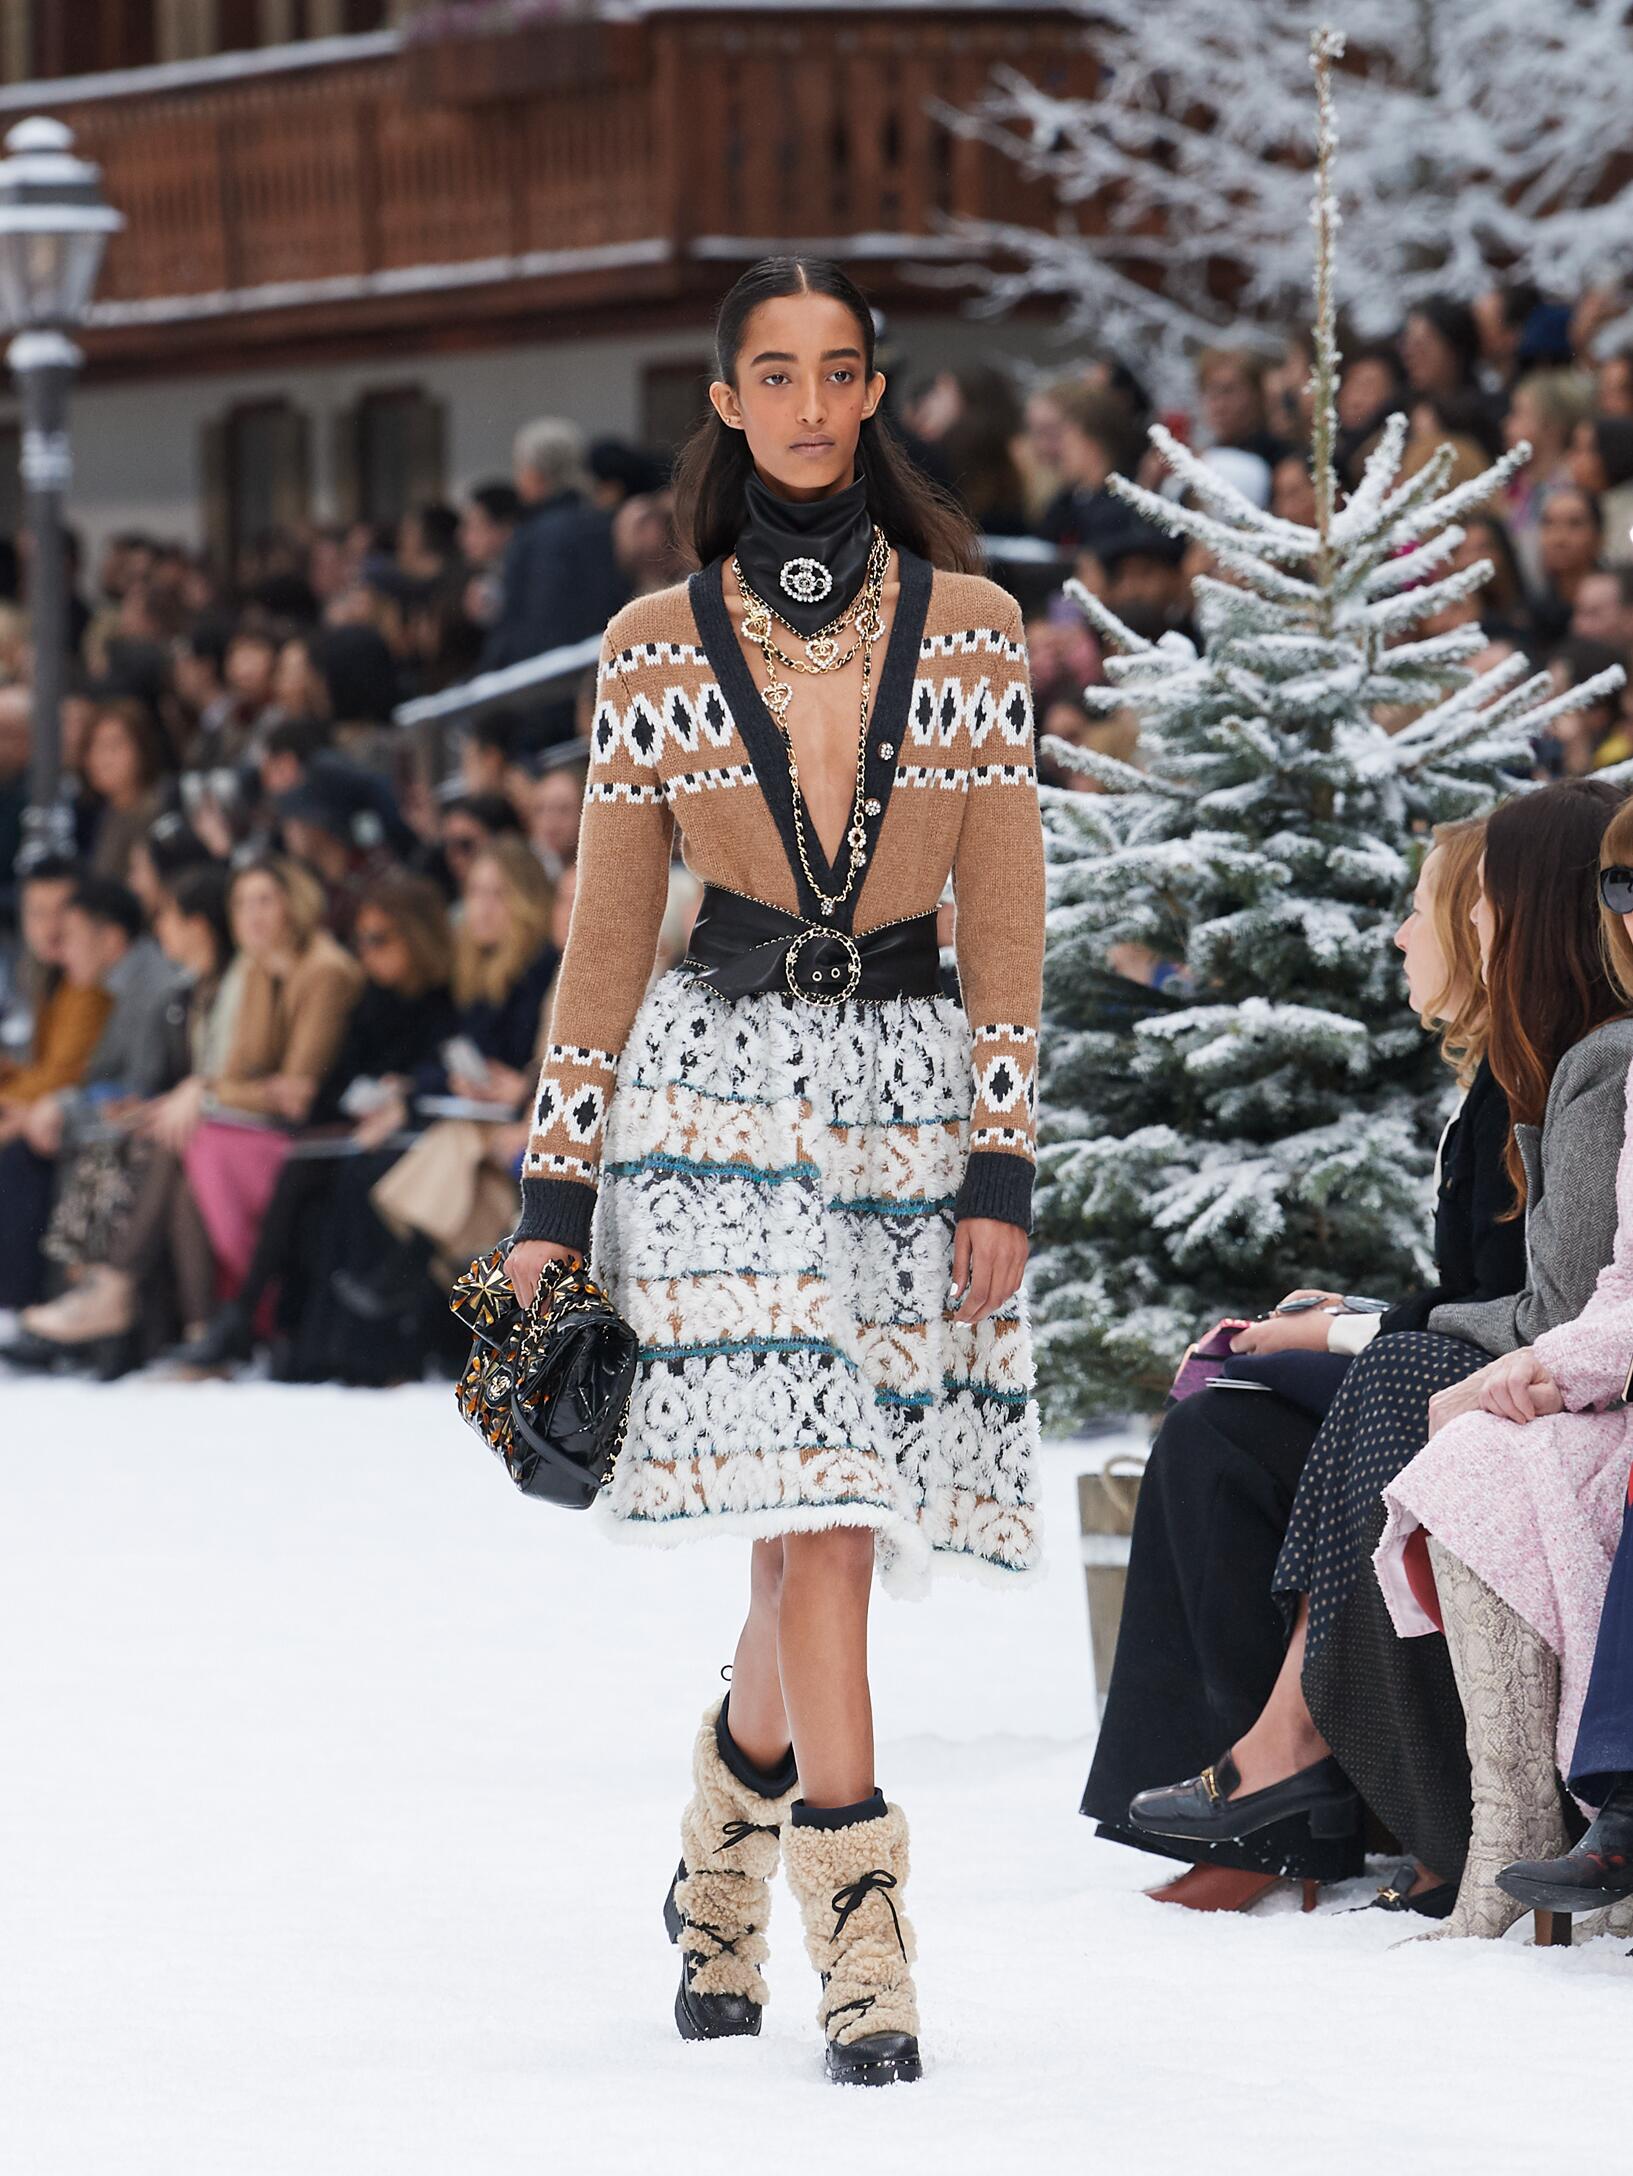 Chanel Fall 2019 Catwalk